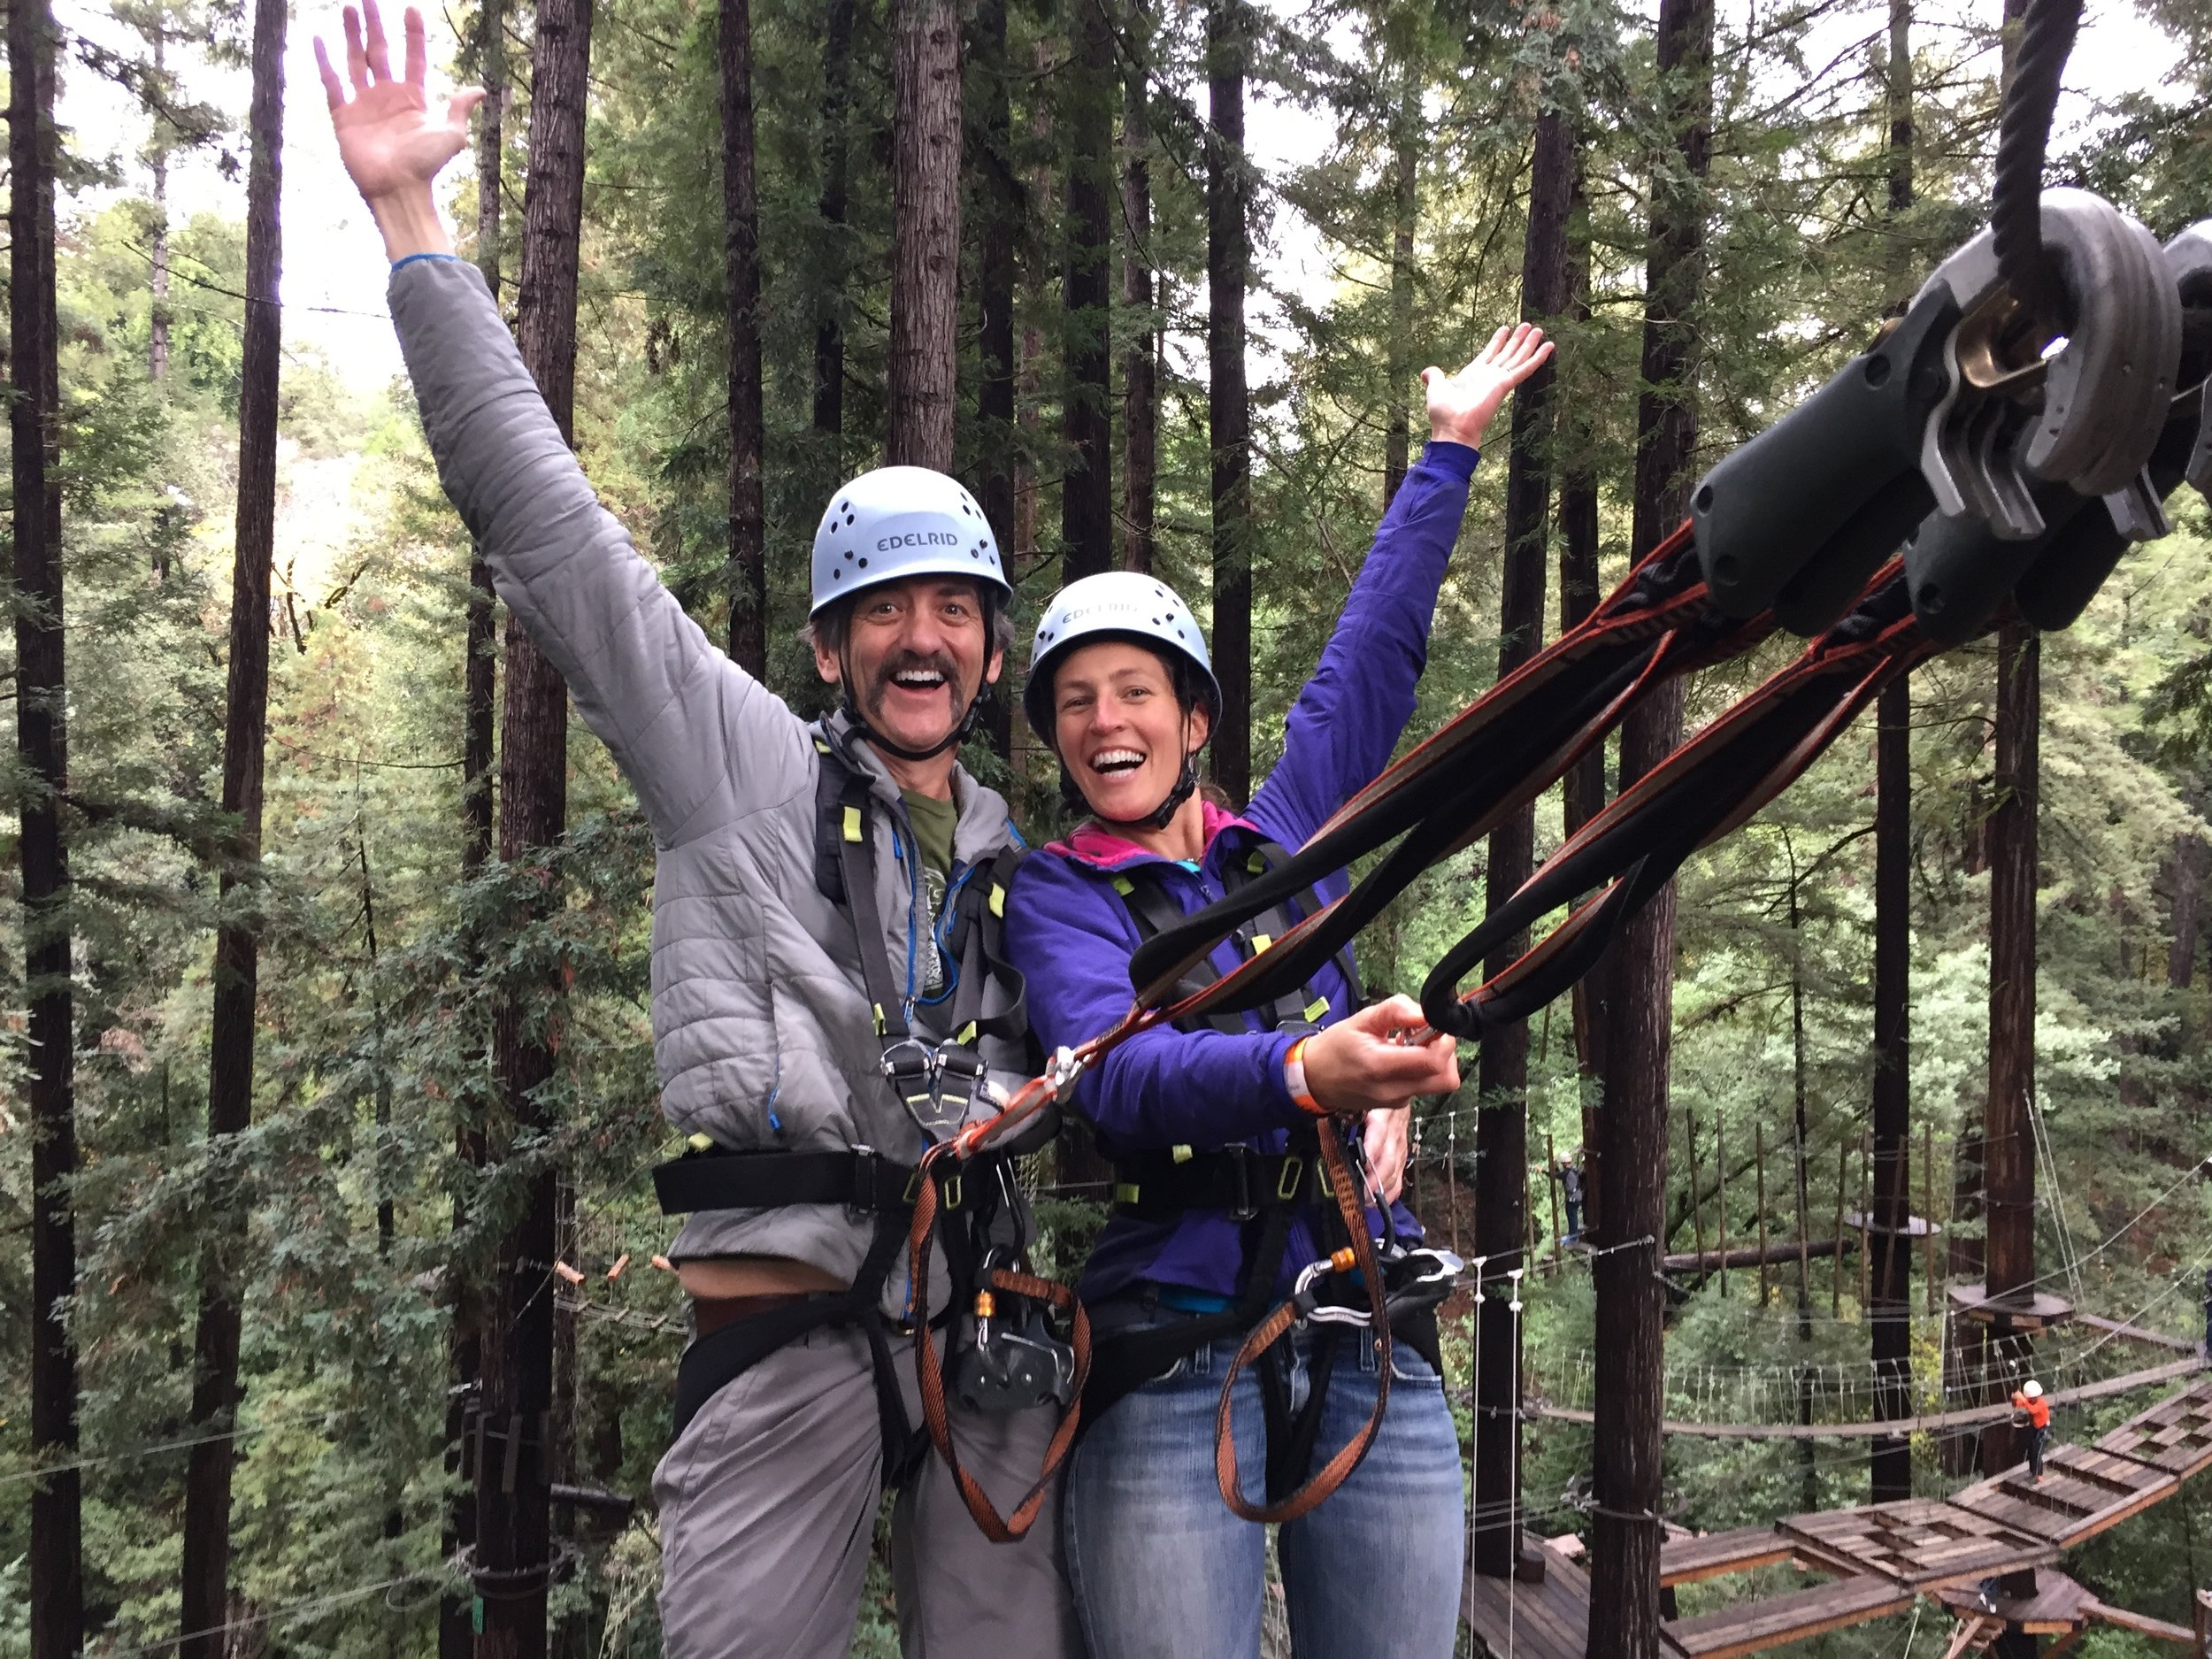 2 Happy Mountain Sea Customers enjoying the Ropes Course!